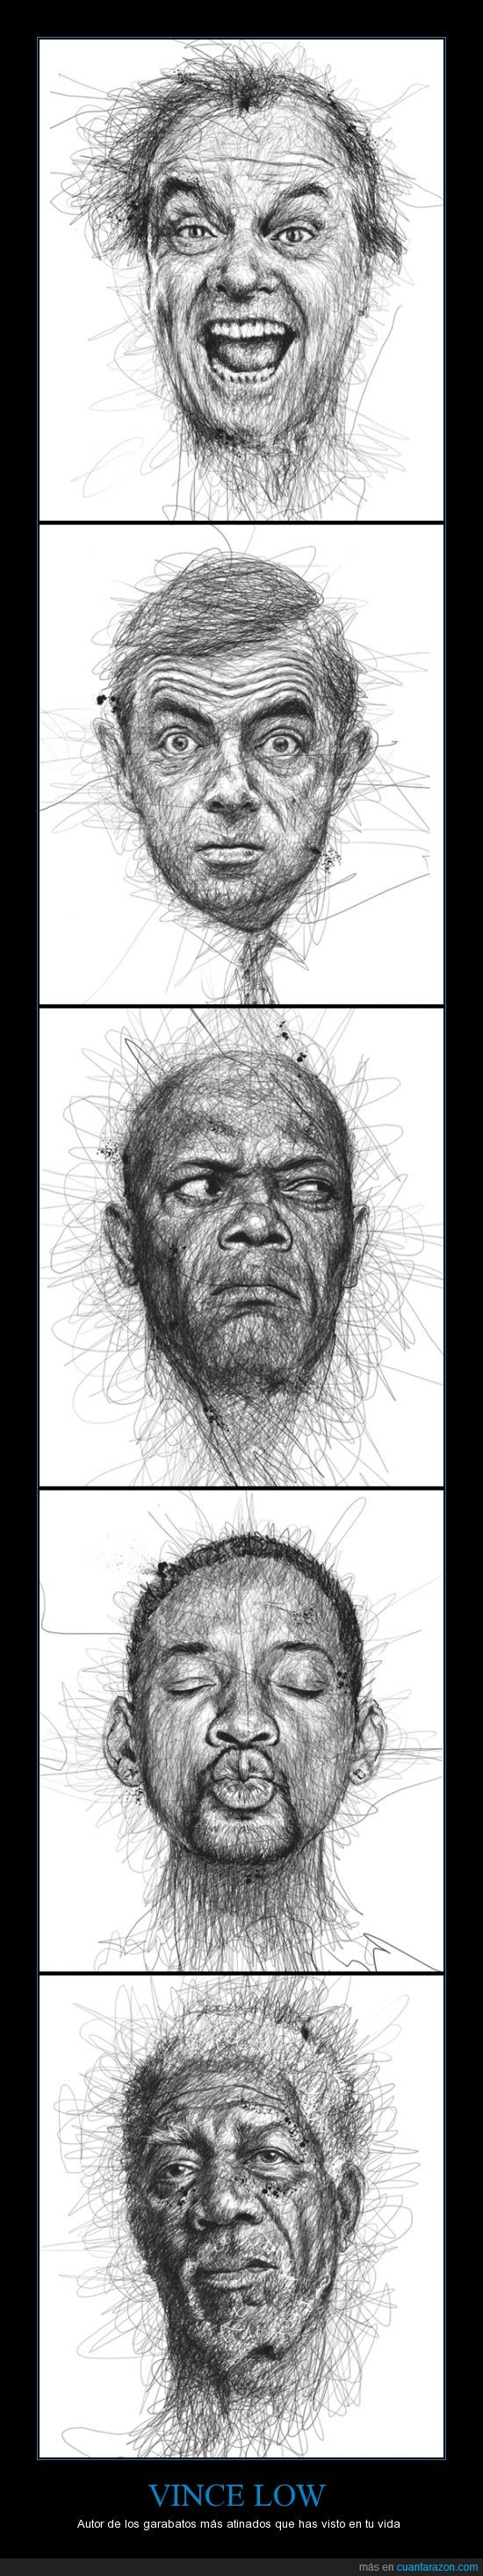 arte,dibujos,garabatos,Jack Nicholson,Morgan Freeman,retratos,Rowan Atkinson,Samuel L Jackson,Vince Low,Will Smith